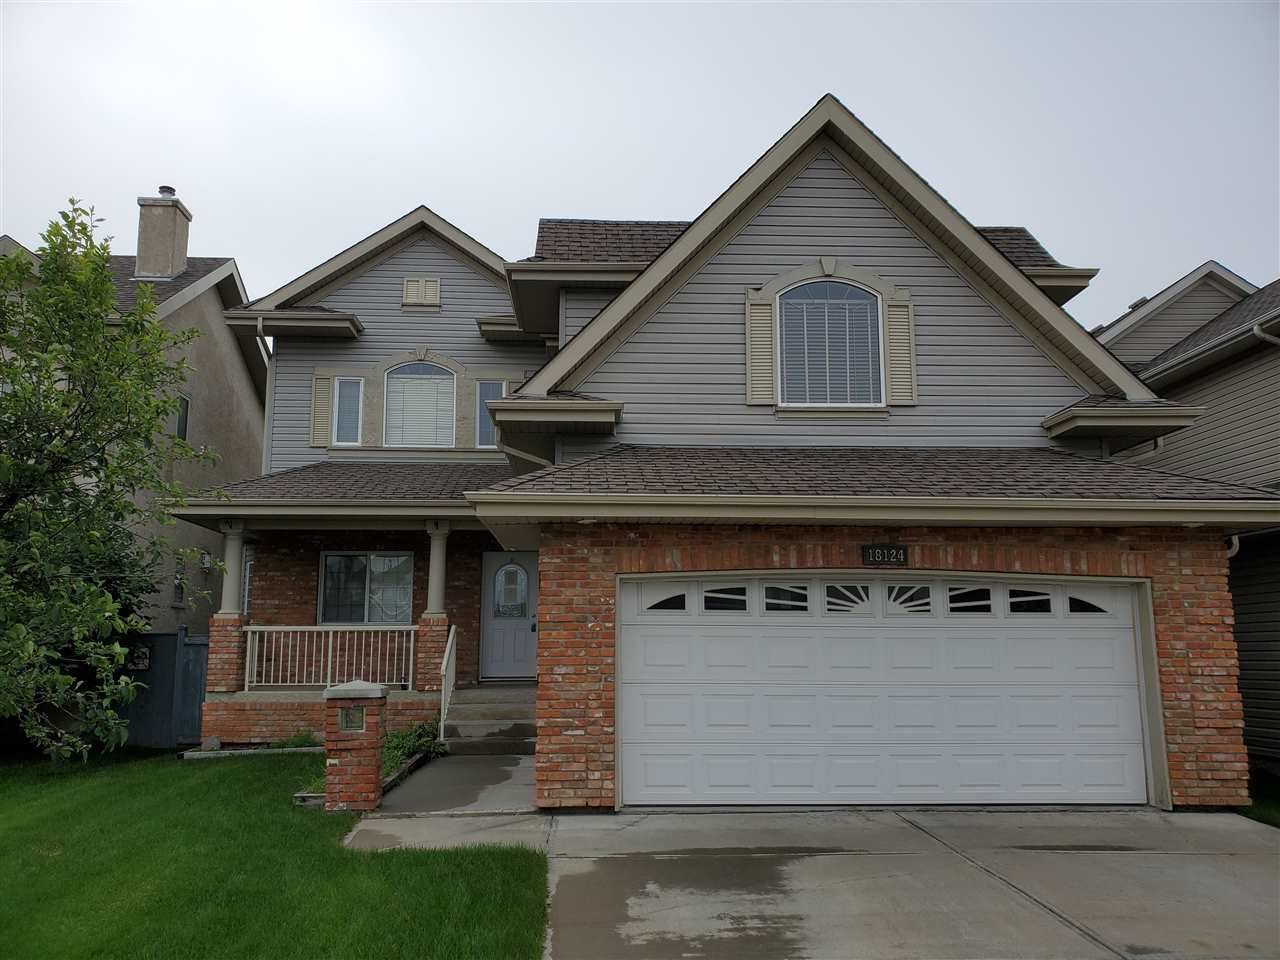 Main Photo: 18124 105 Street in Edmonton: Zone 27 House for sale : MLS®# E4206172